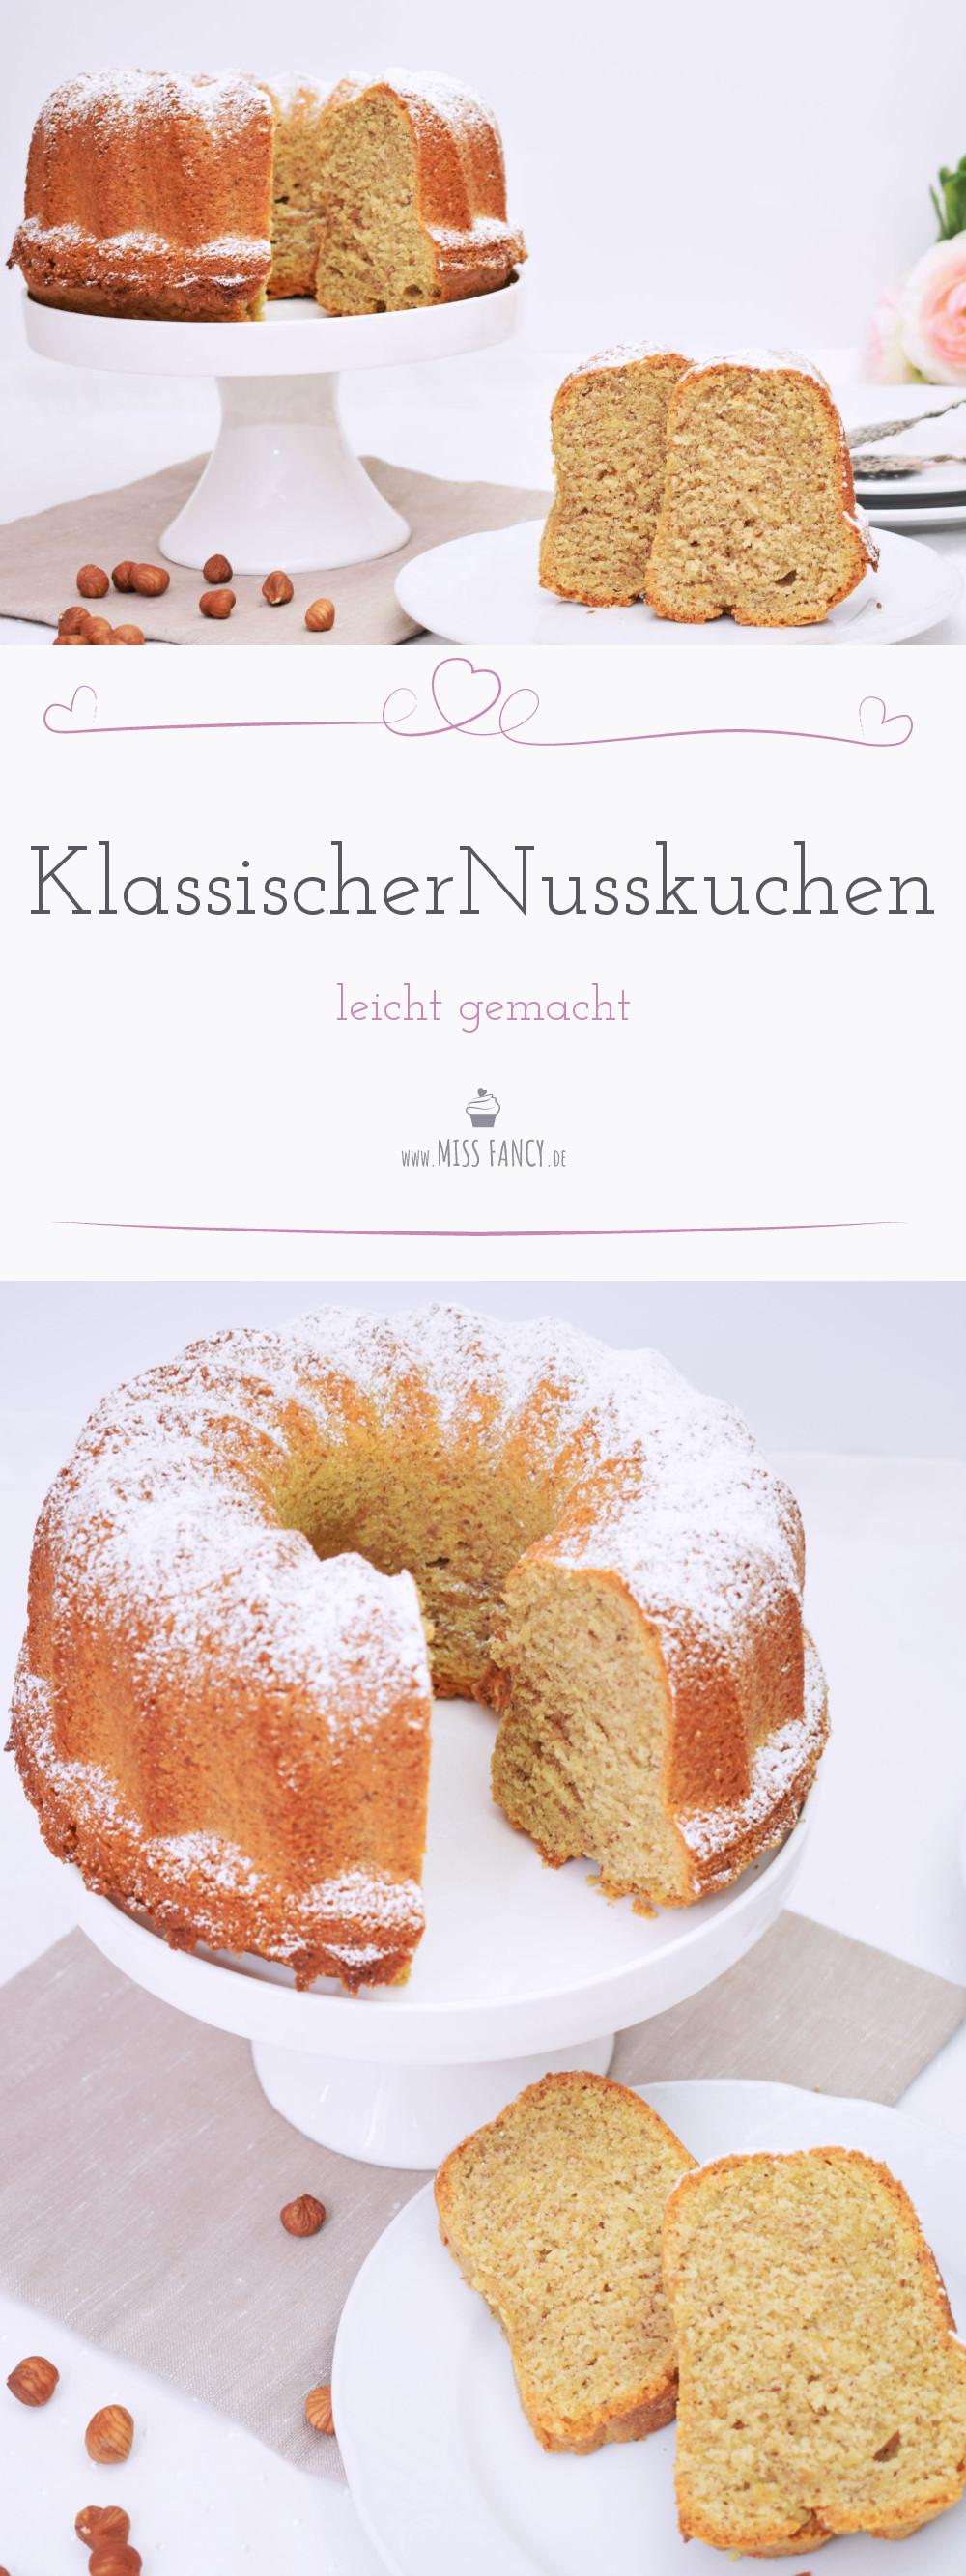 Rezept Nusskuchen klassisch Missfancy Foodblog